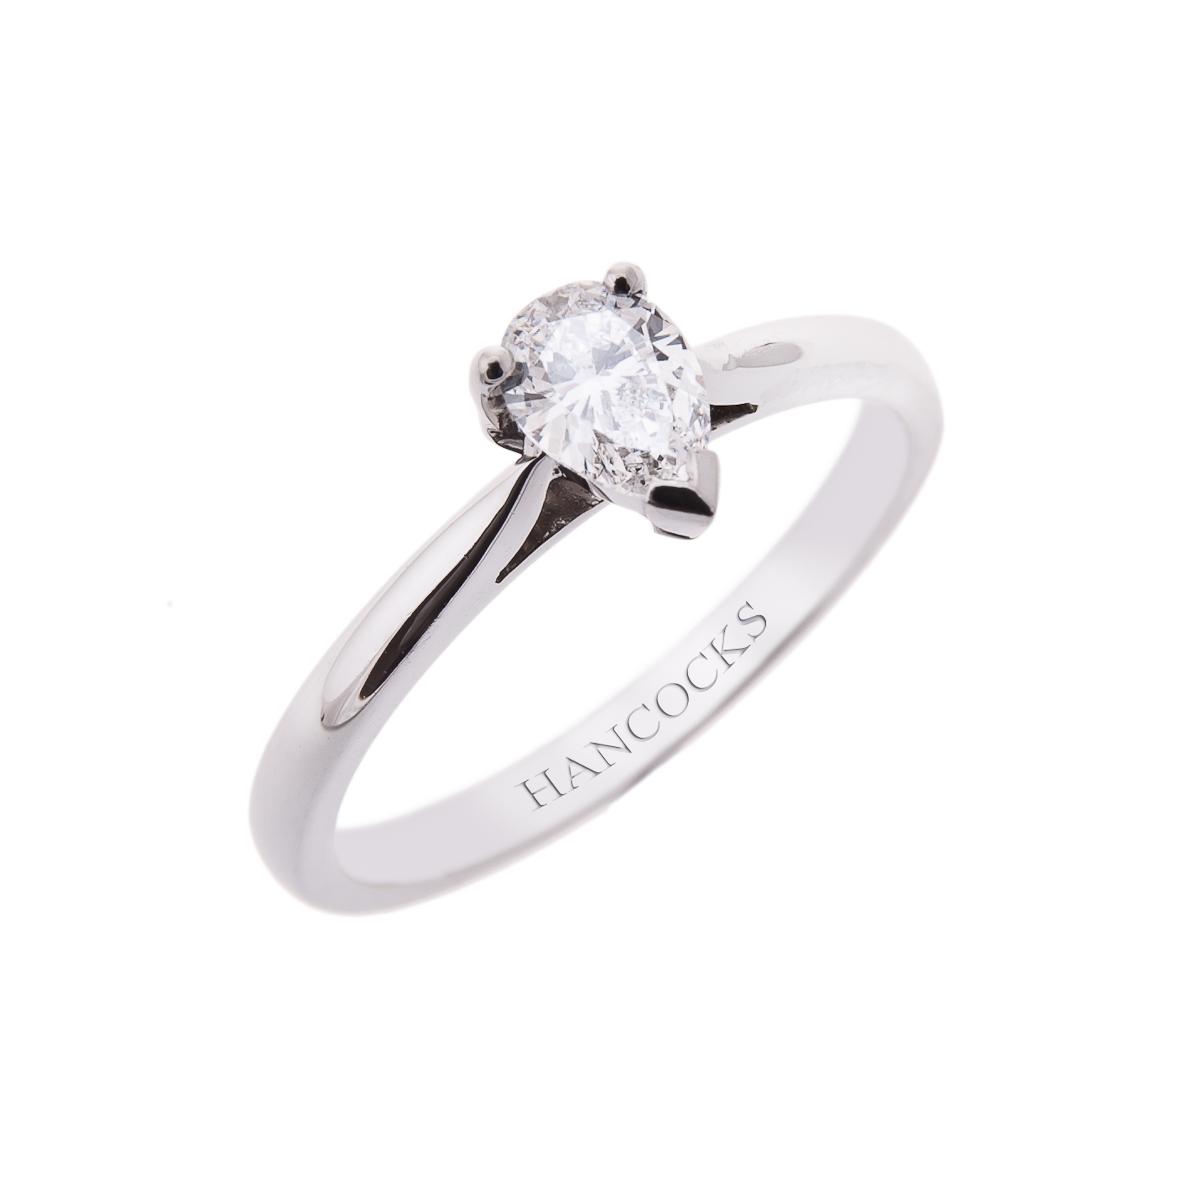 claw-set-pear-cut-diamond-single-stone-ring